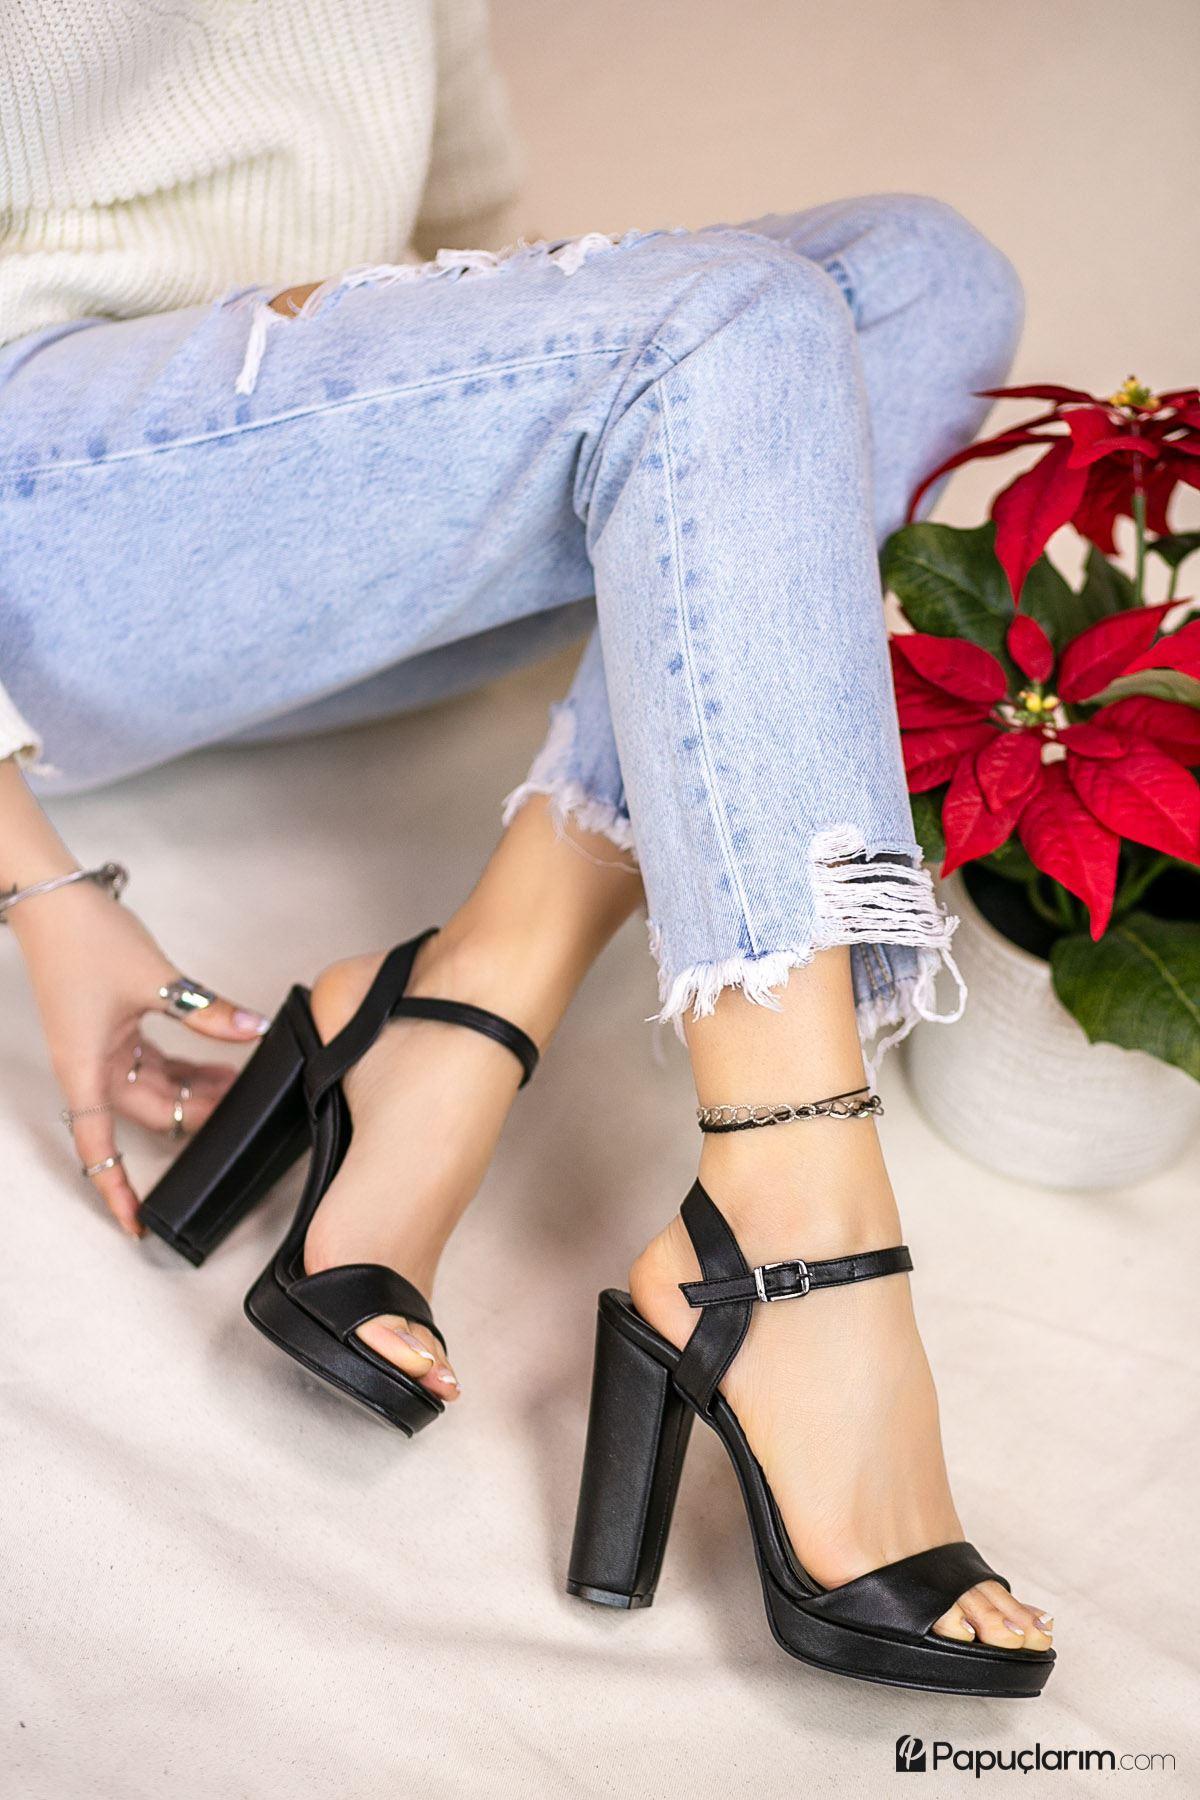 Alicia Siyah Mat Deri Yüksek Platform Kadın Topuklu Ayakkabı